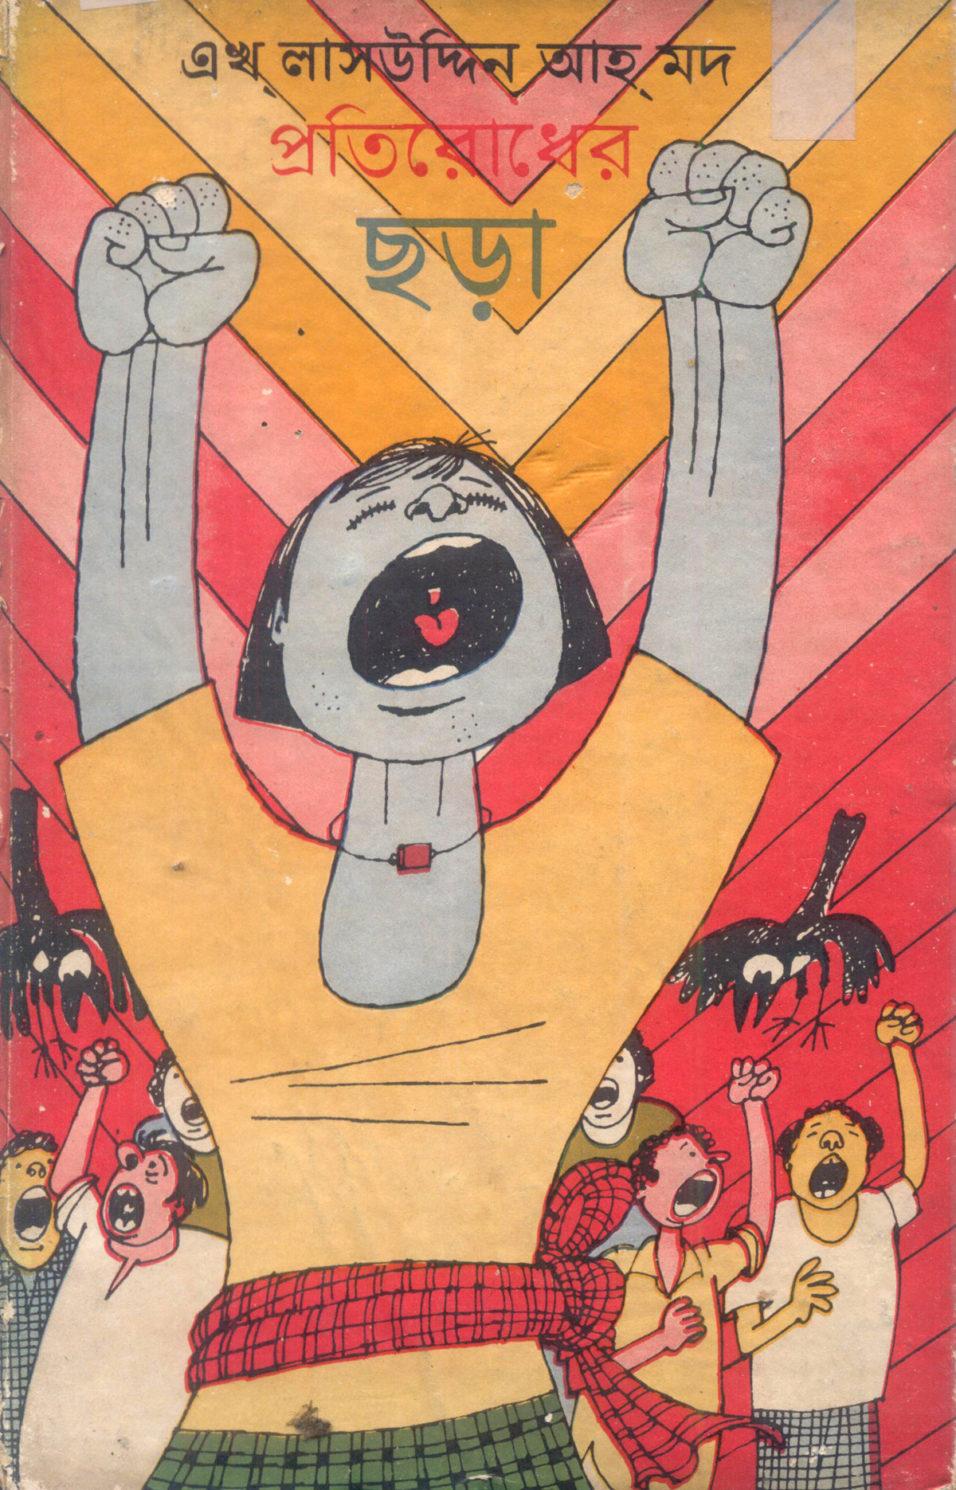 Cartoonpattor_Protirodher-Chhora-2